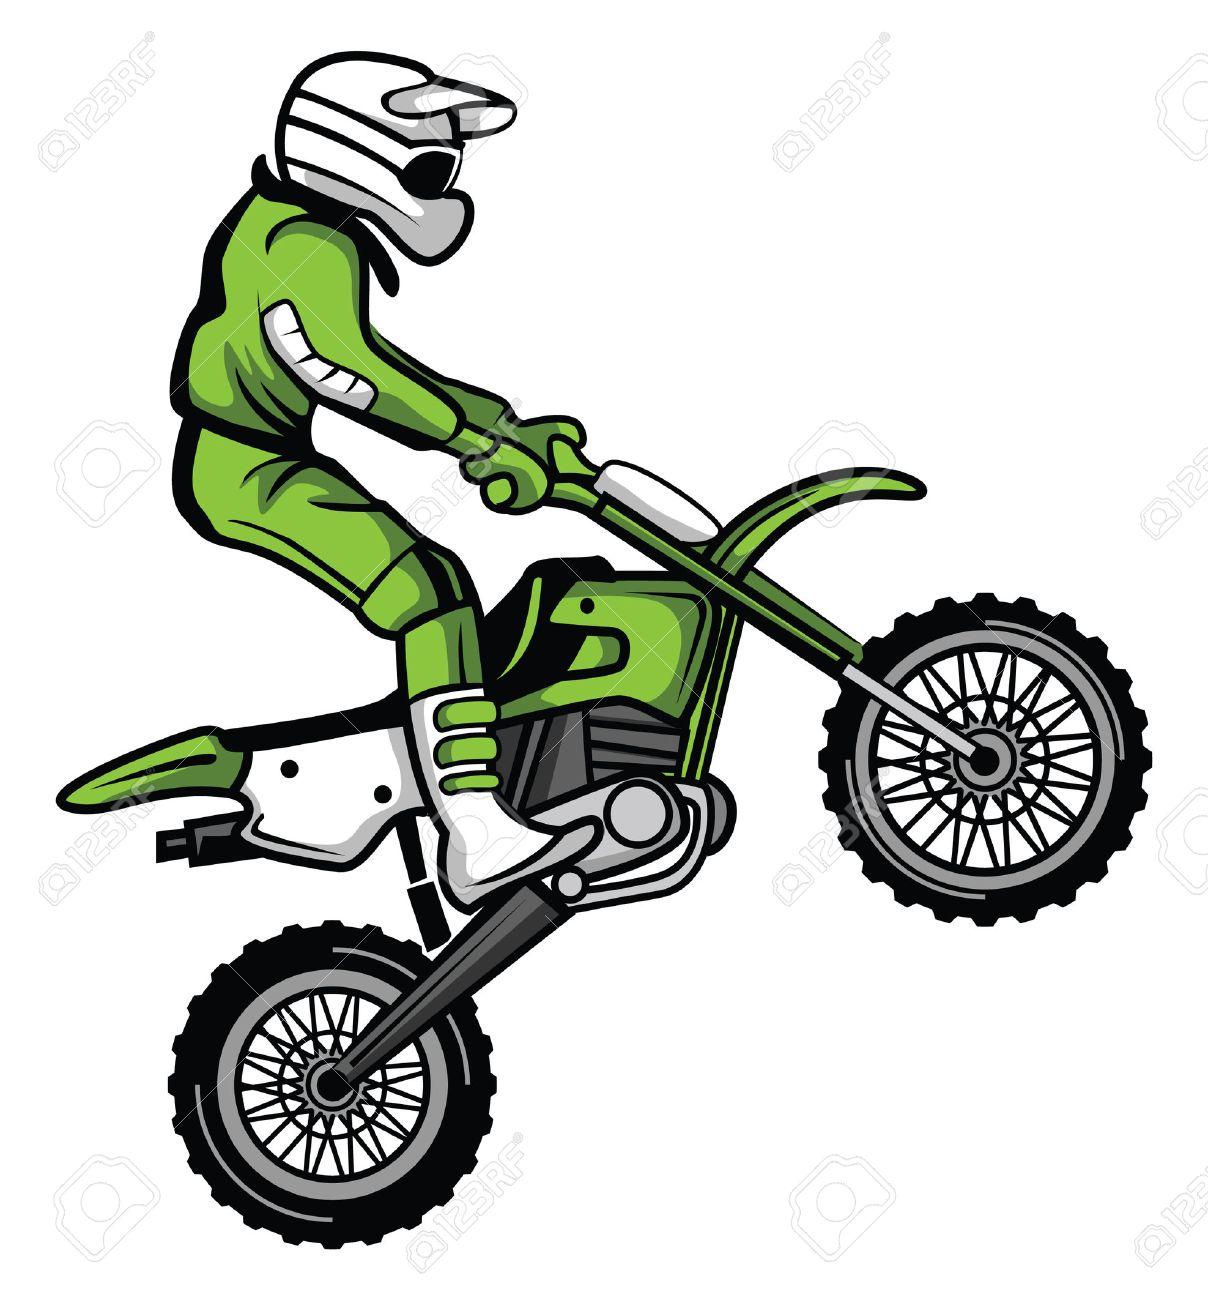 1208x1300 Dirt Bike Clipart Free 31661245 Moto Cross